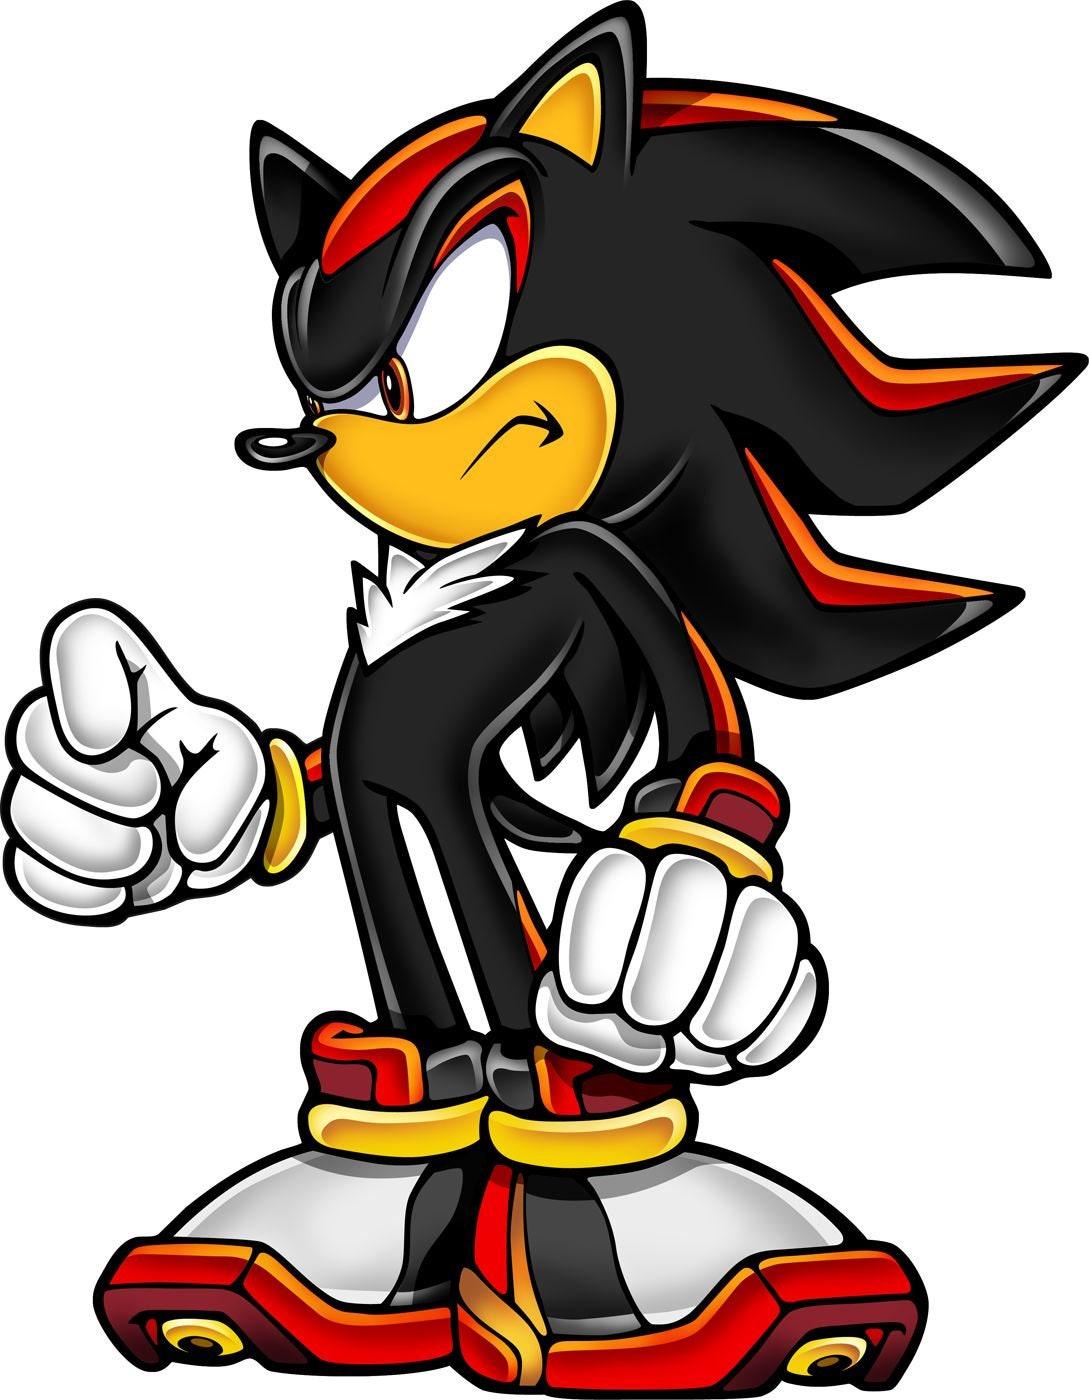 Shadow The Hedgehog Sonic The Hedgehog Heat Transfer Iron On For Light Fabric 2